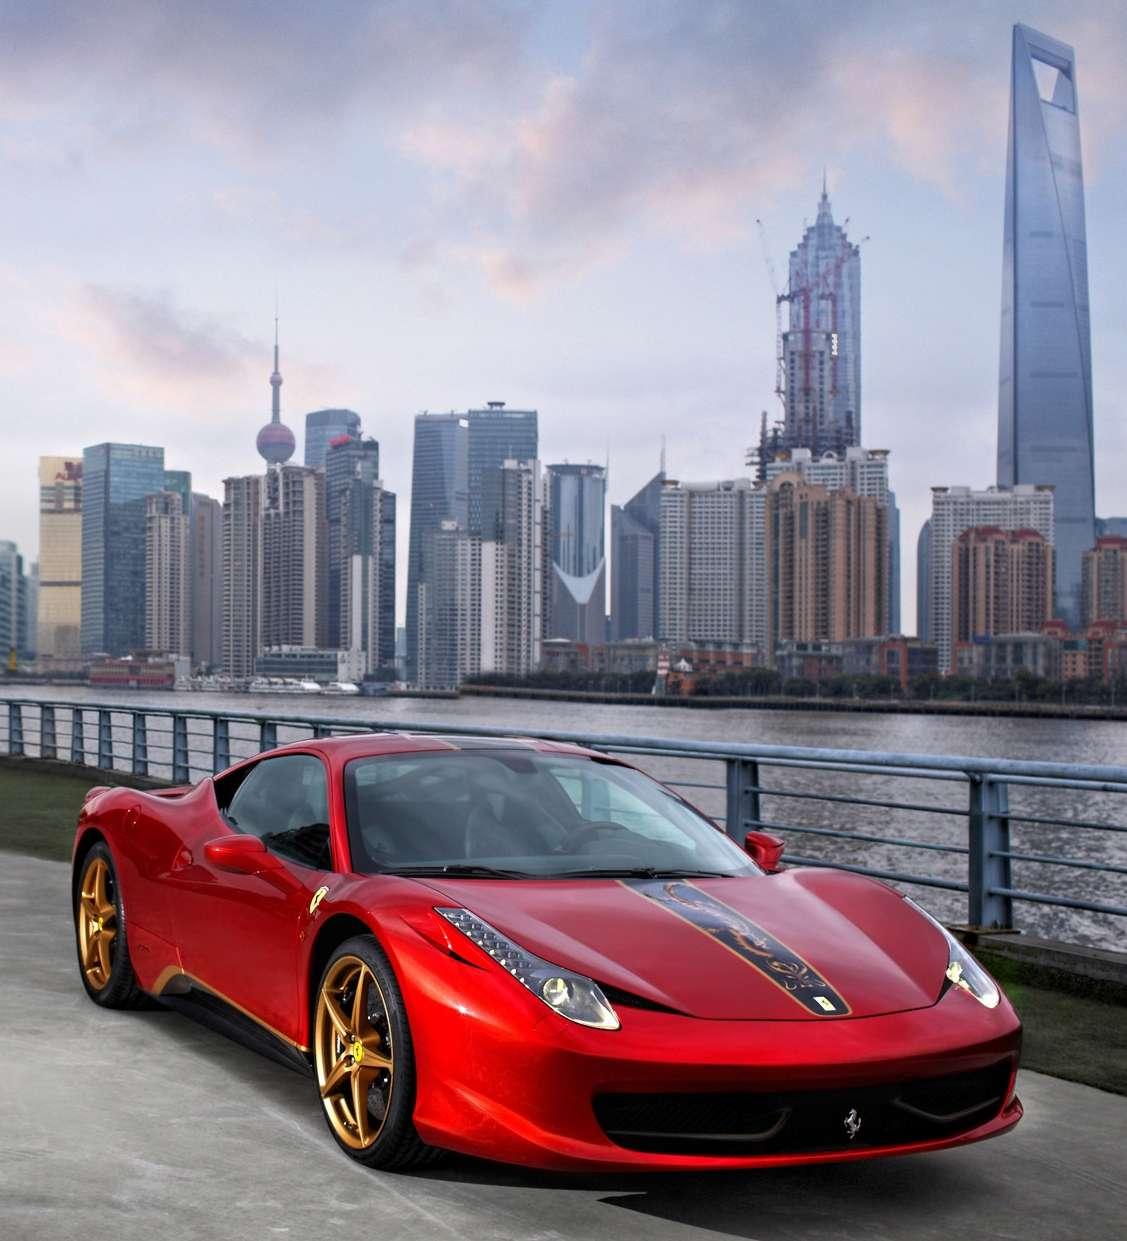 Ferrari 458: Ferrari 458 China Special Edition